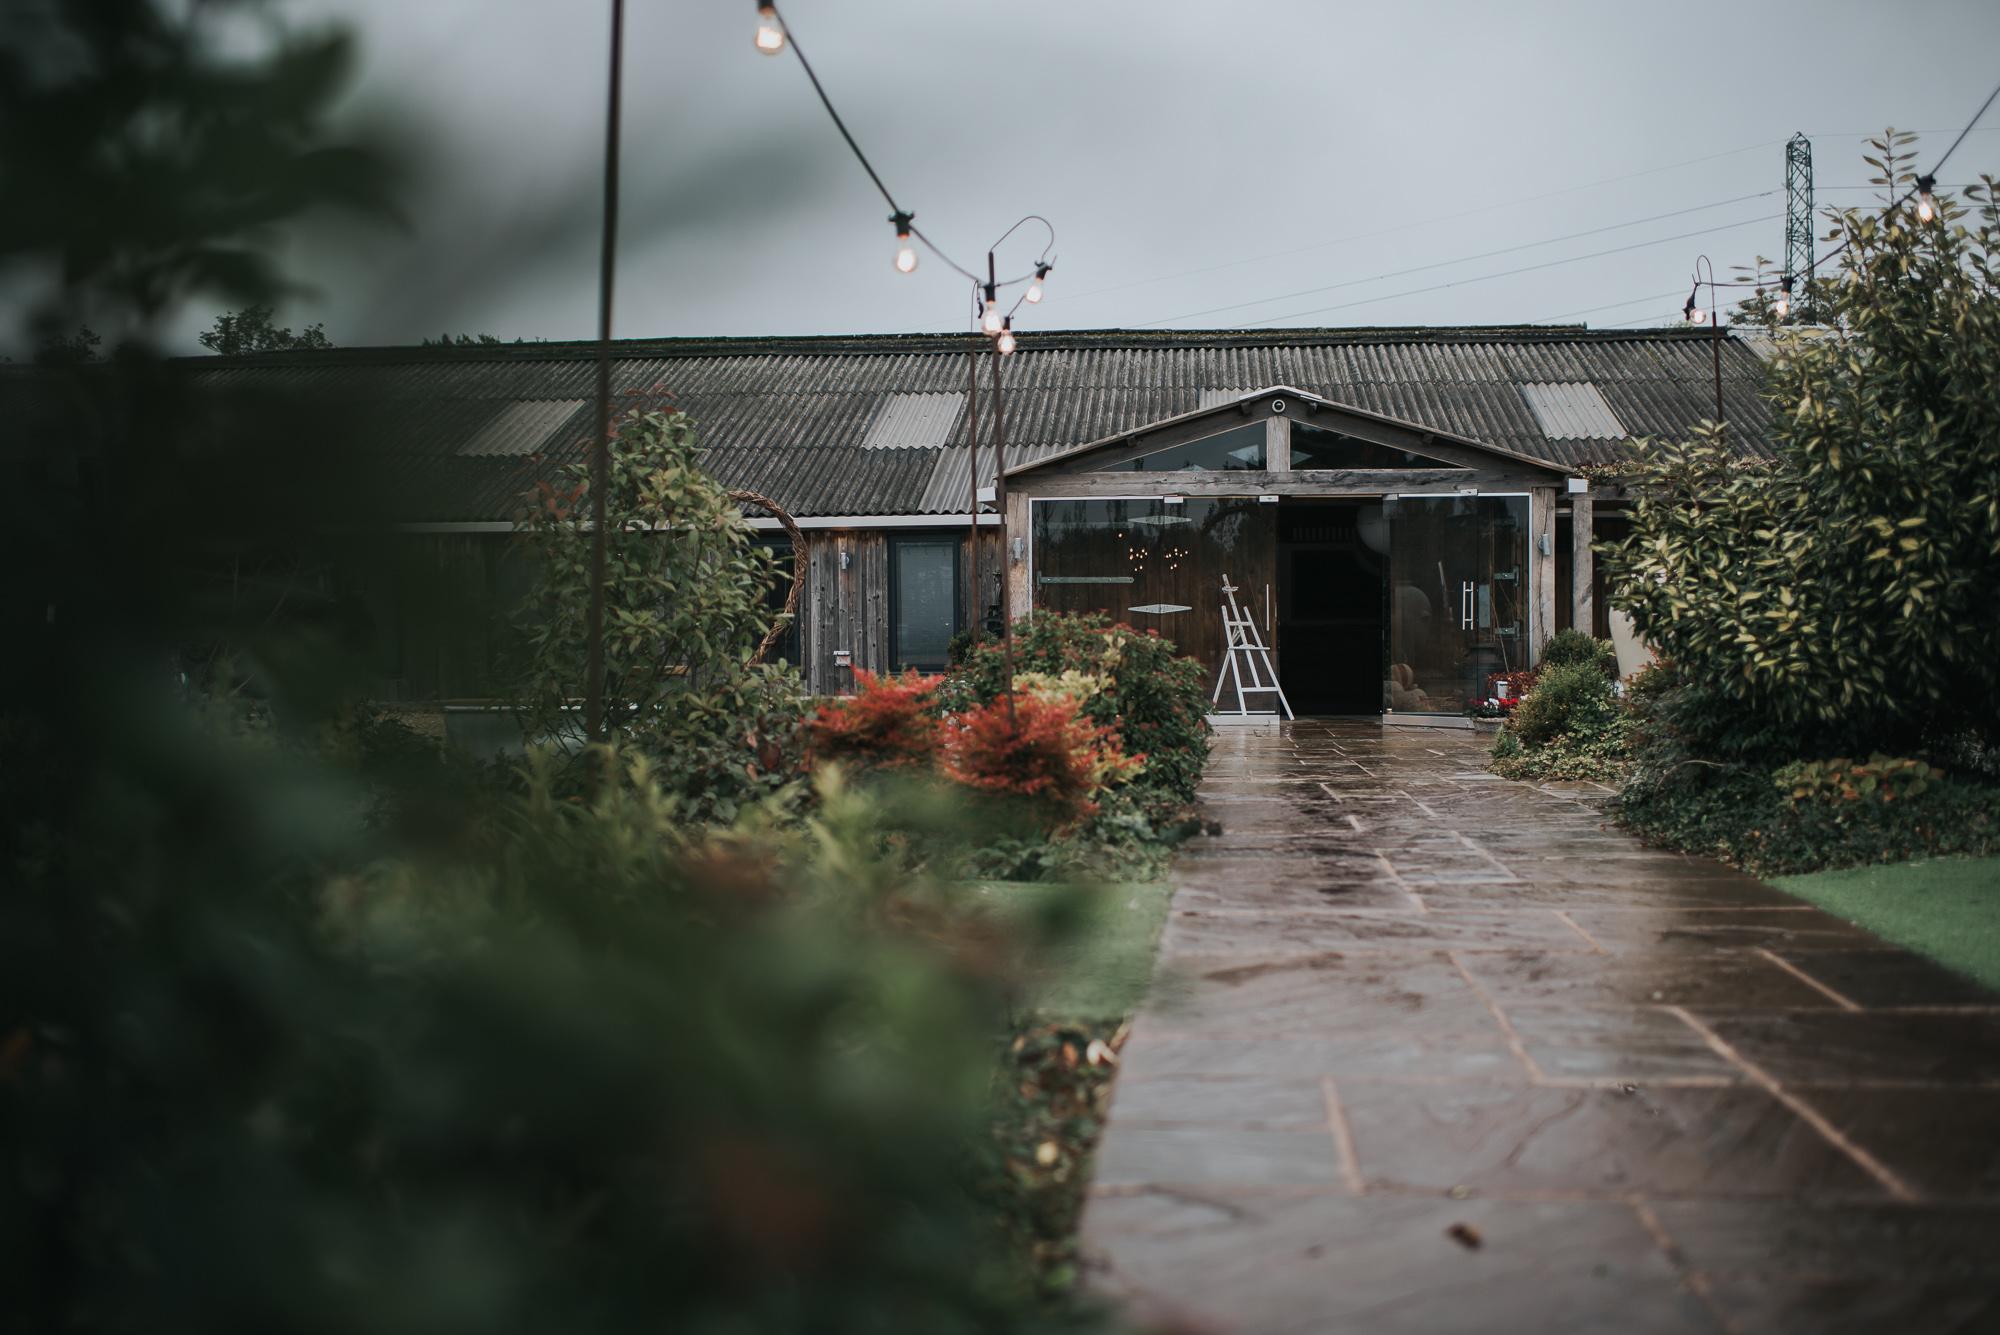 Owen house wedding barn wedding photographer north west cheshire england (1 of 38).jpg